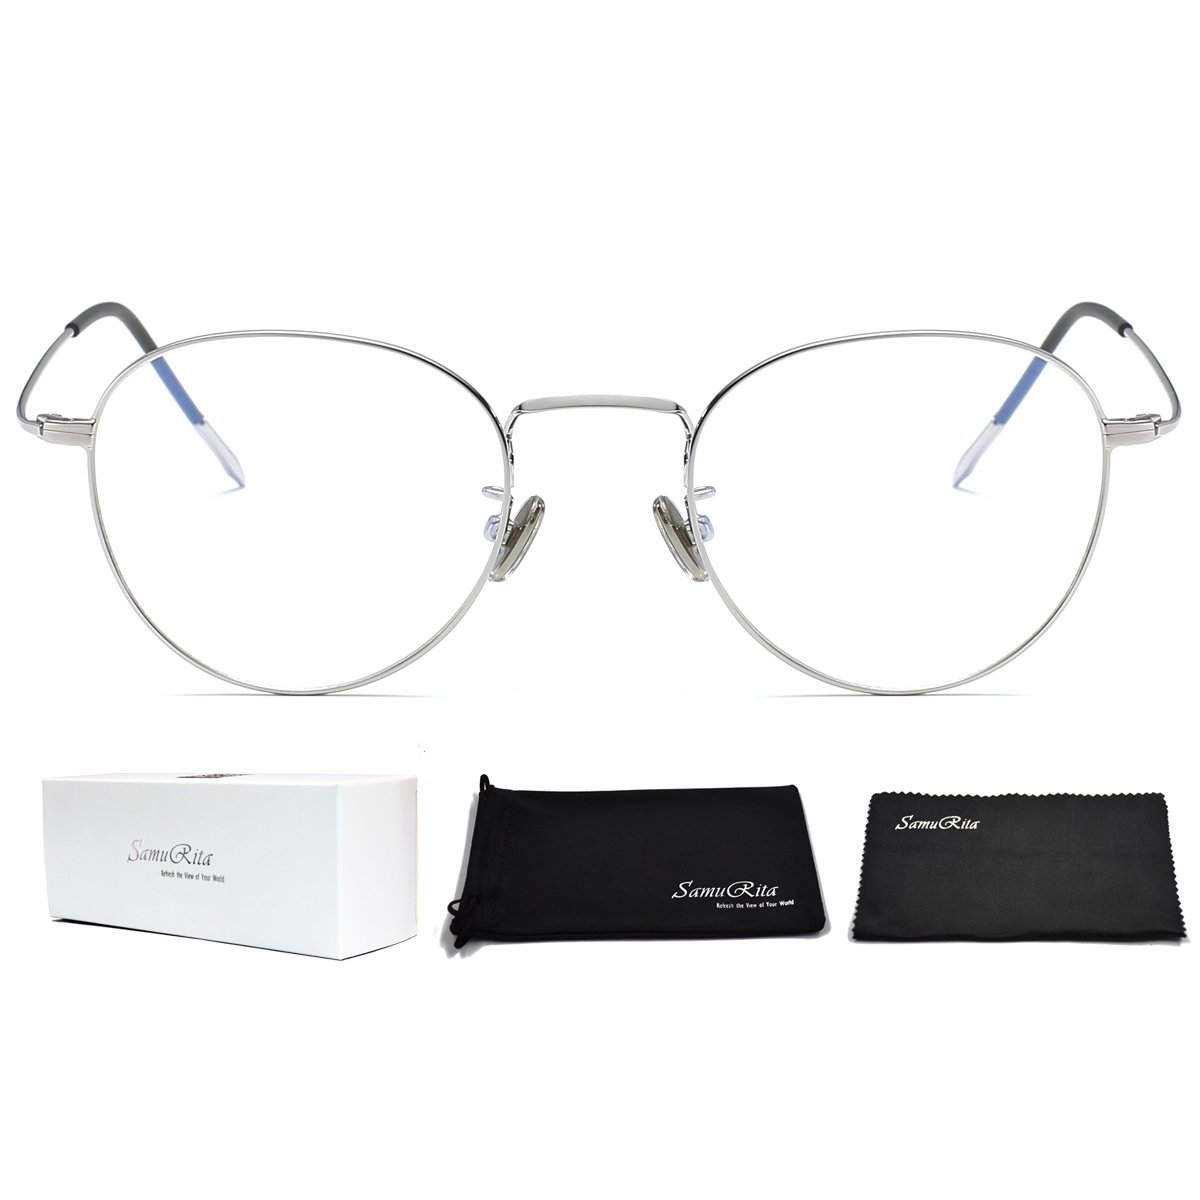 SamuRita Ultra Thin Classic Metal Round Oval Glasses Full Rim Clear Lens Sunglasses Eyeglasses Frame(Silver Frame)